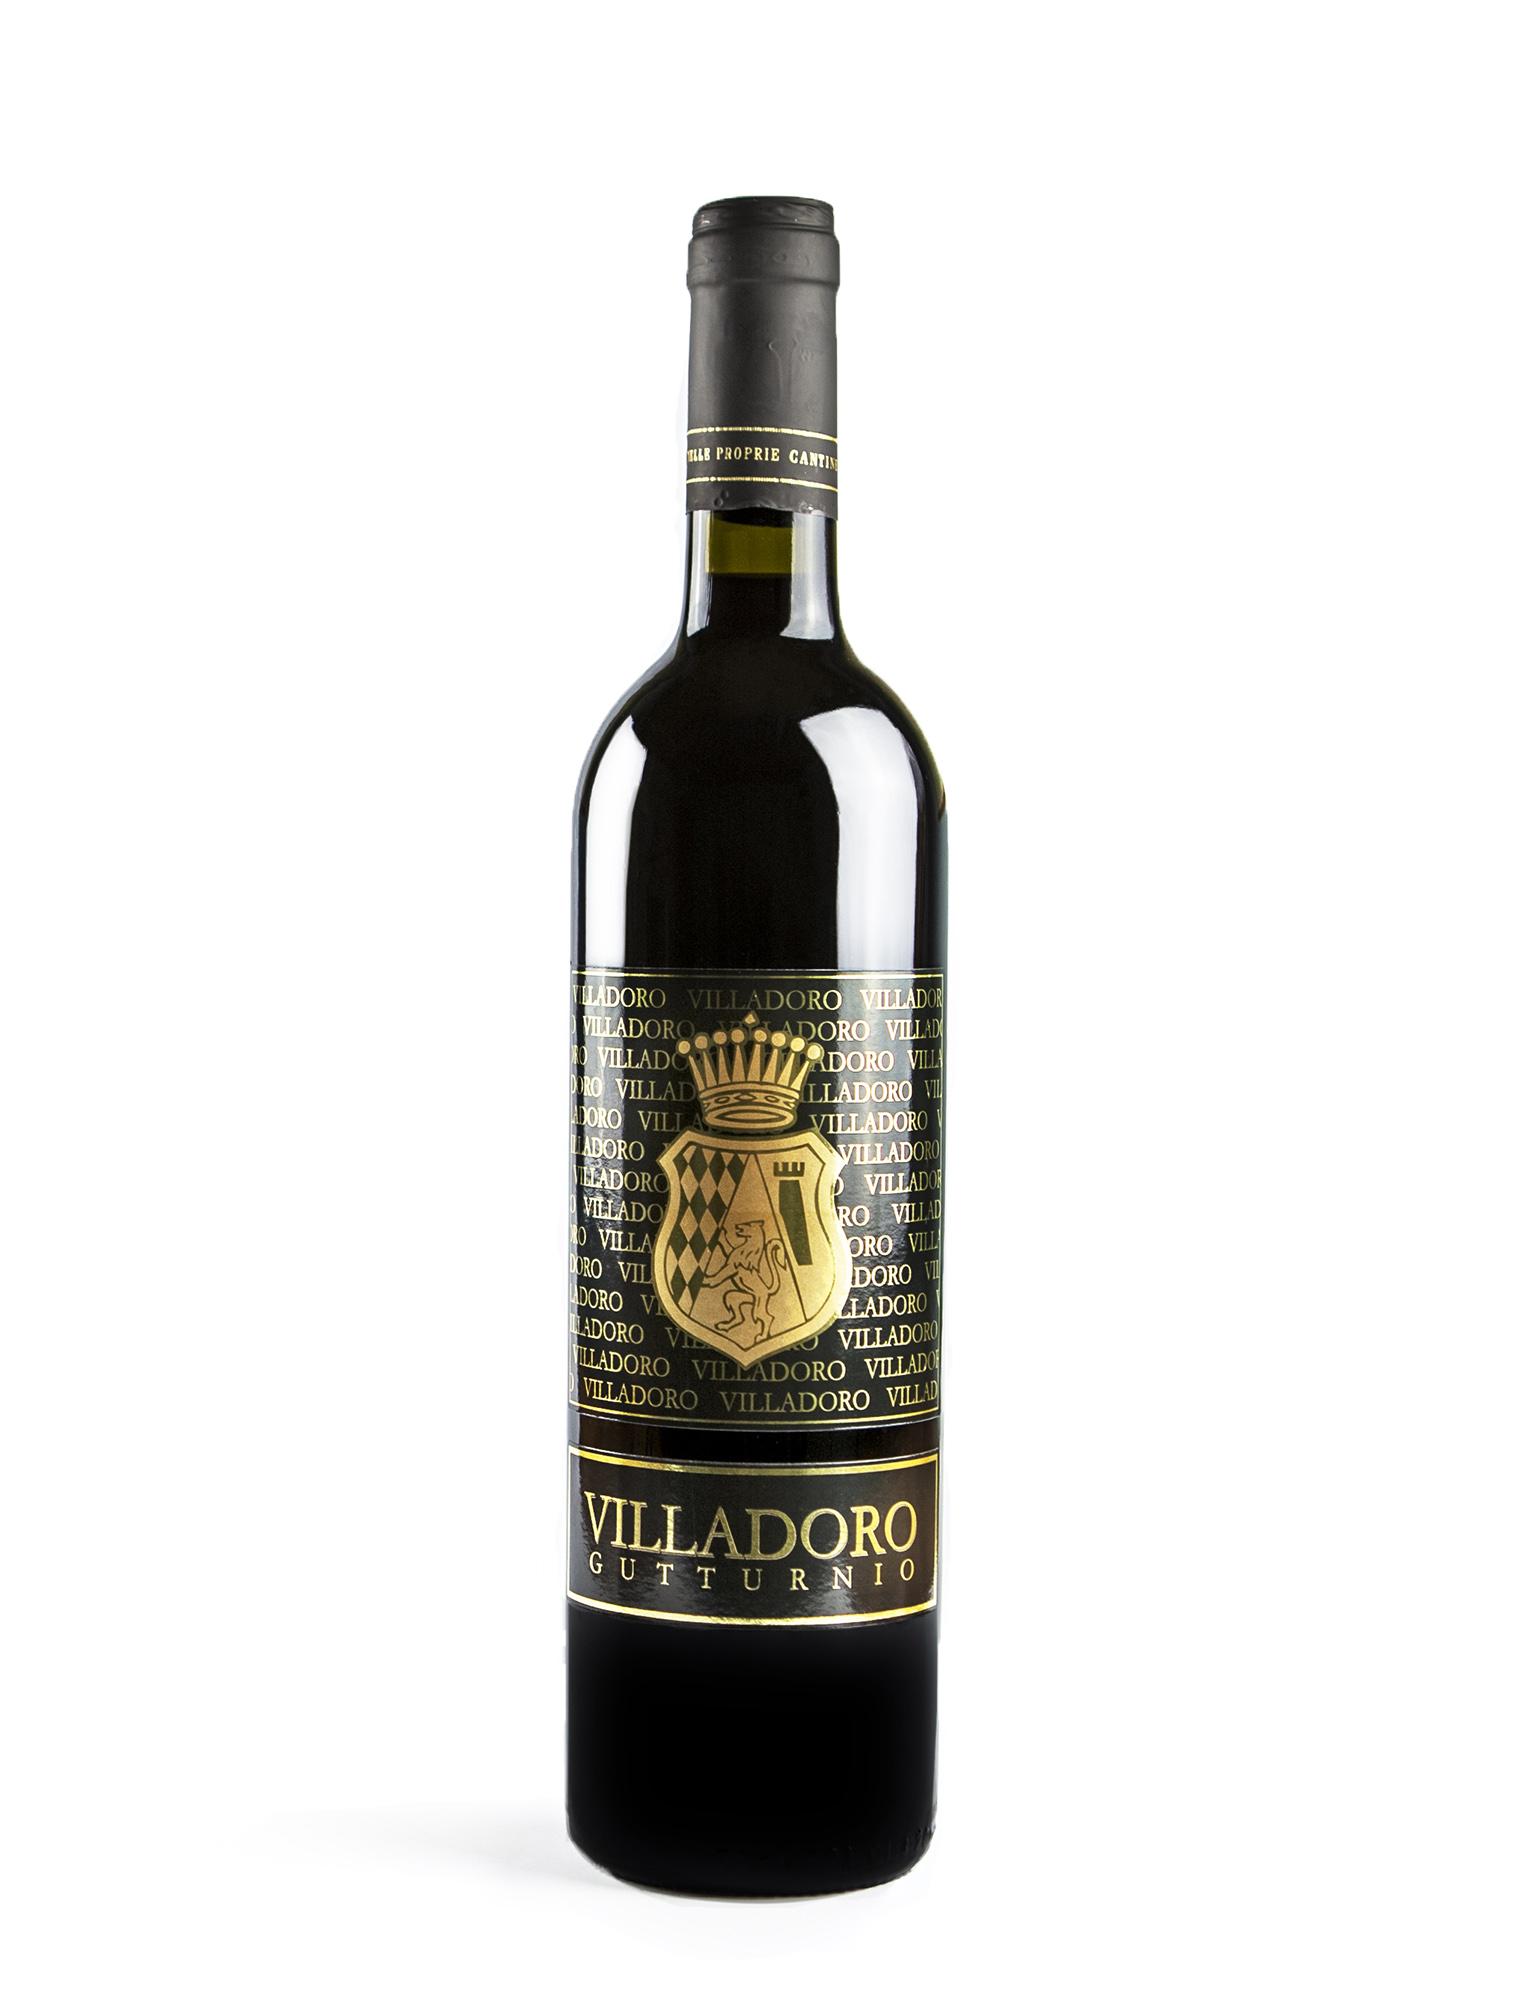 VILLADORO Gutturnio vino rosso